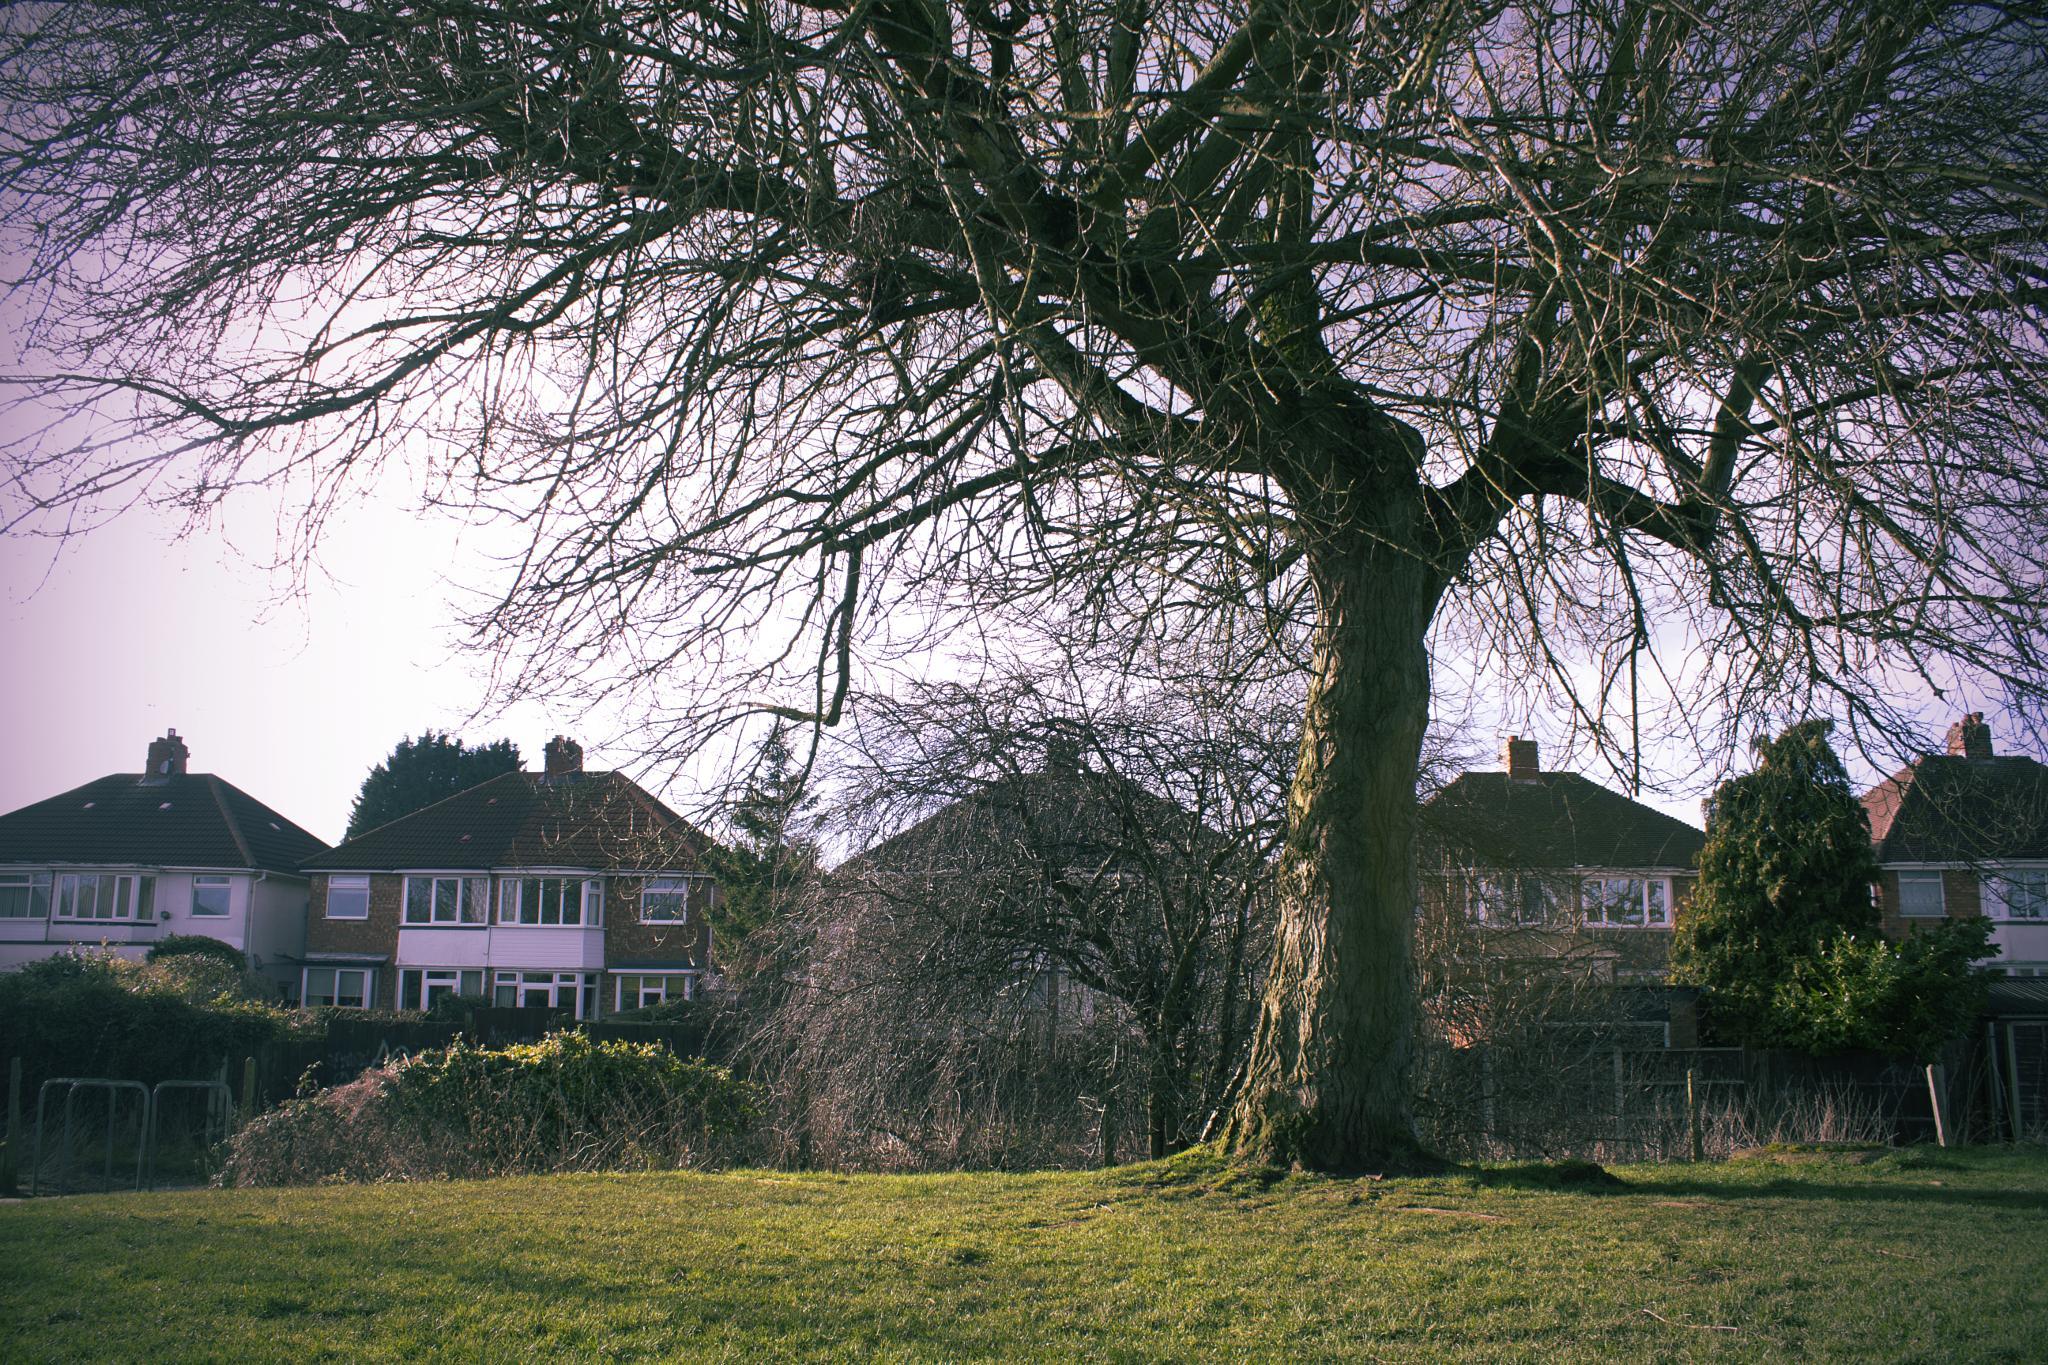 Winter Tree by Mesmerize